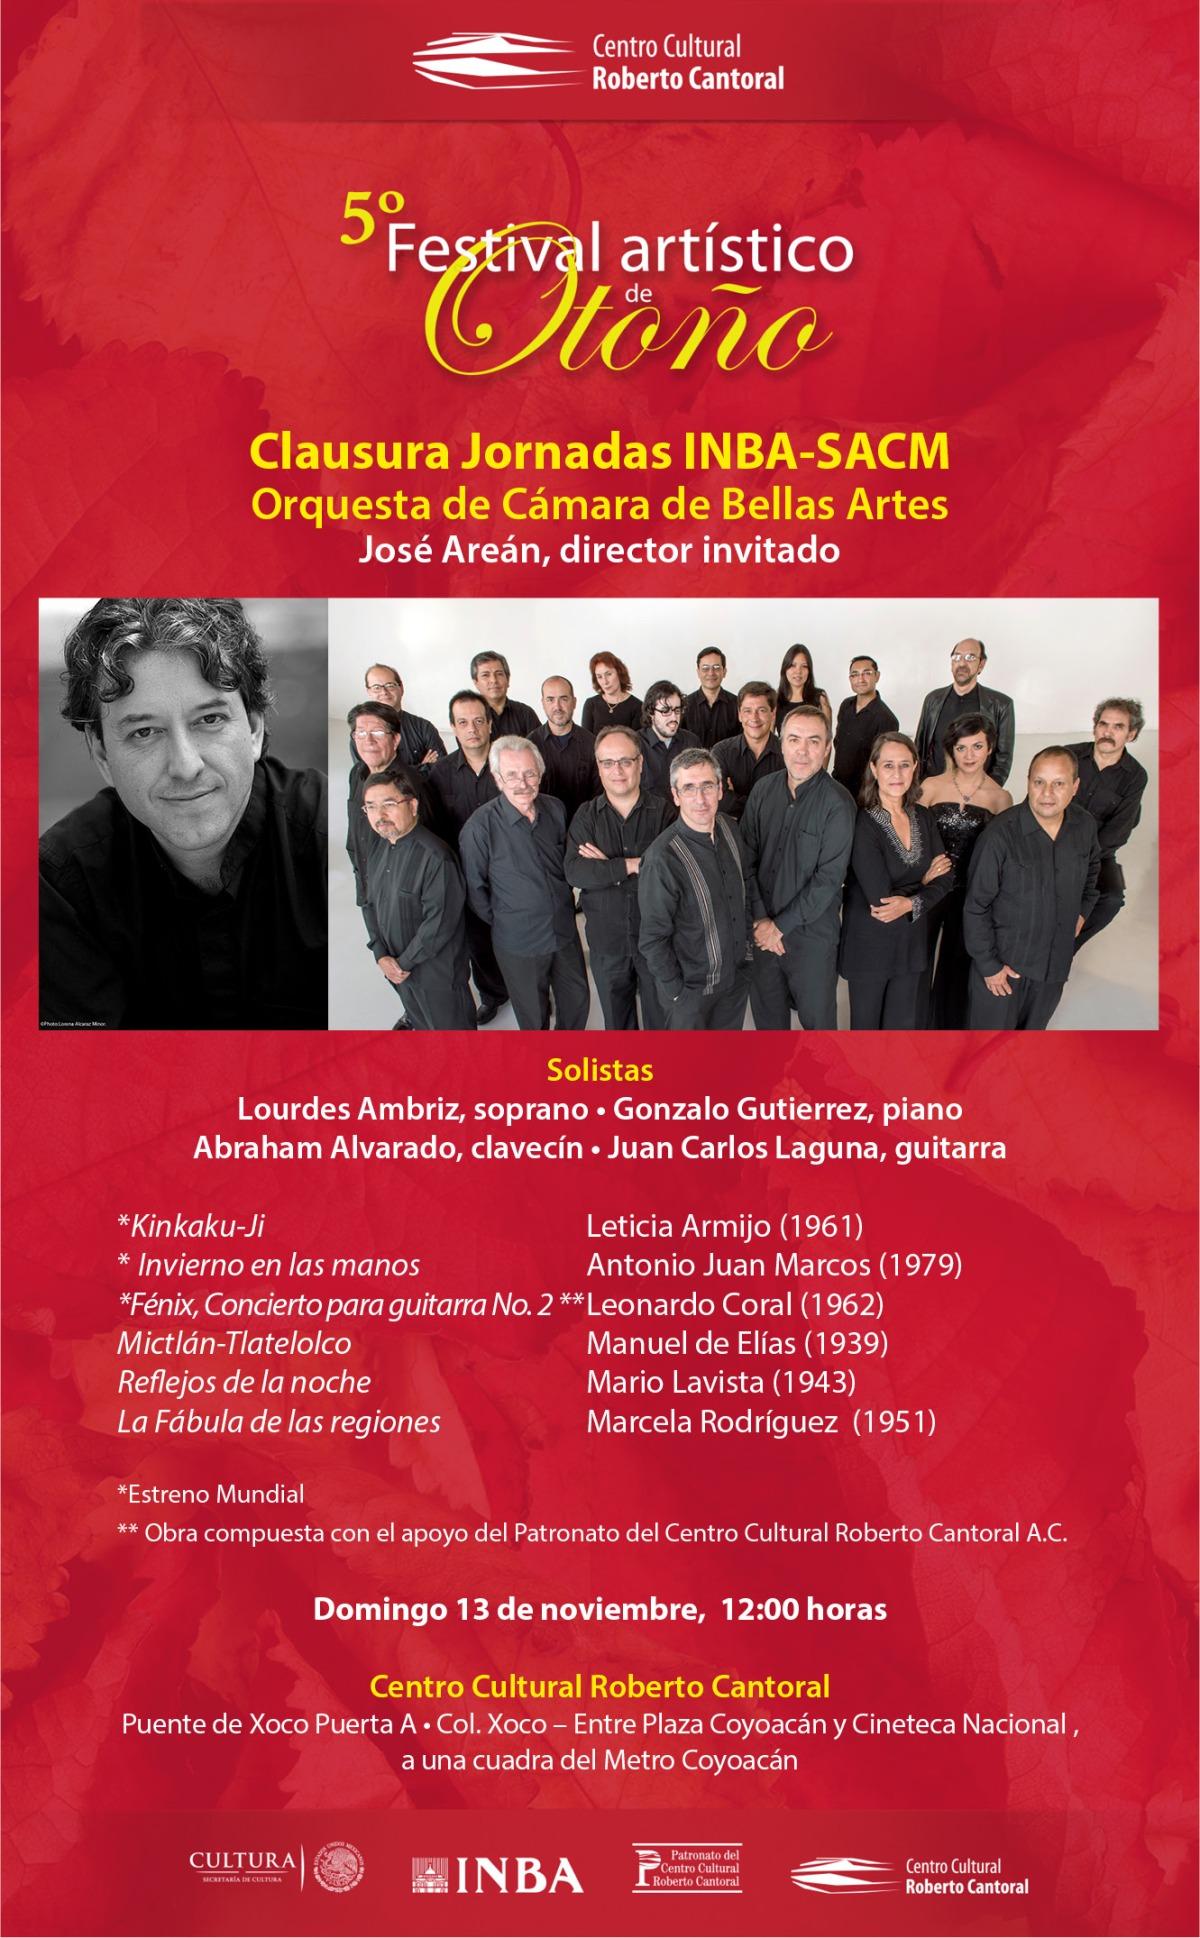 jornadas-inba-sacm-clausura-2016